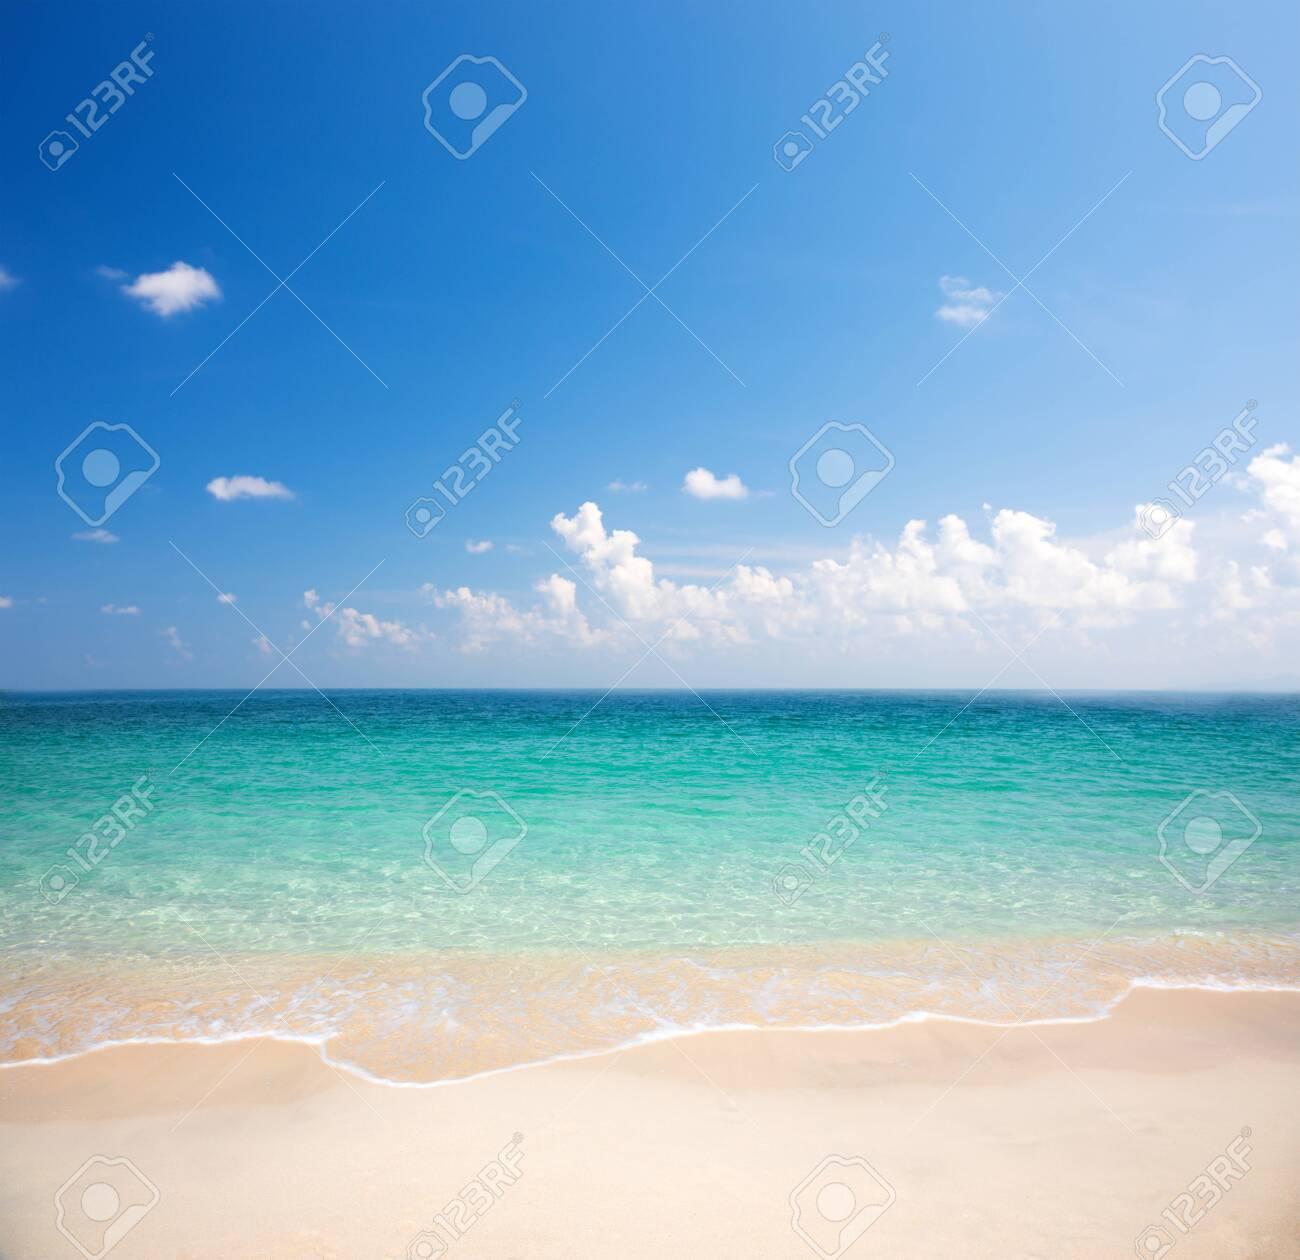 beautiful beach and tropical sea - 138731609